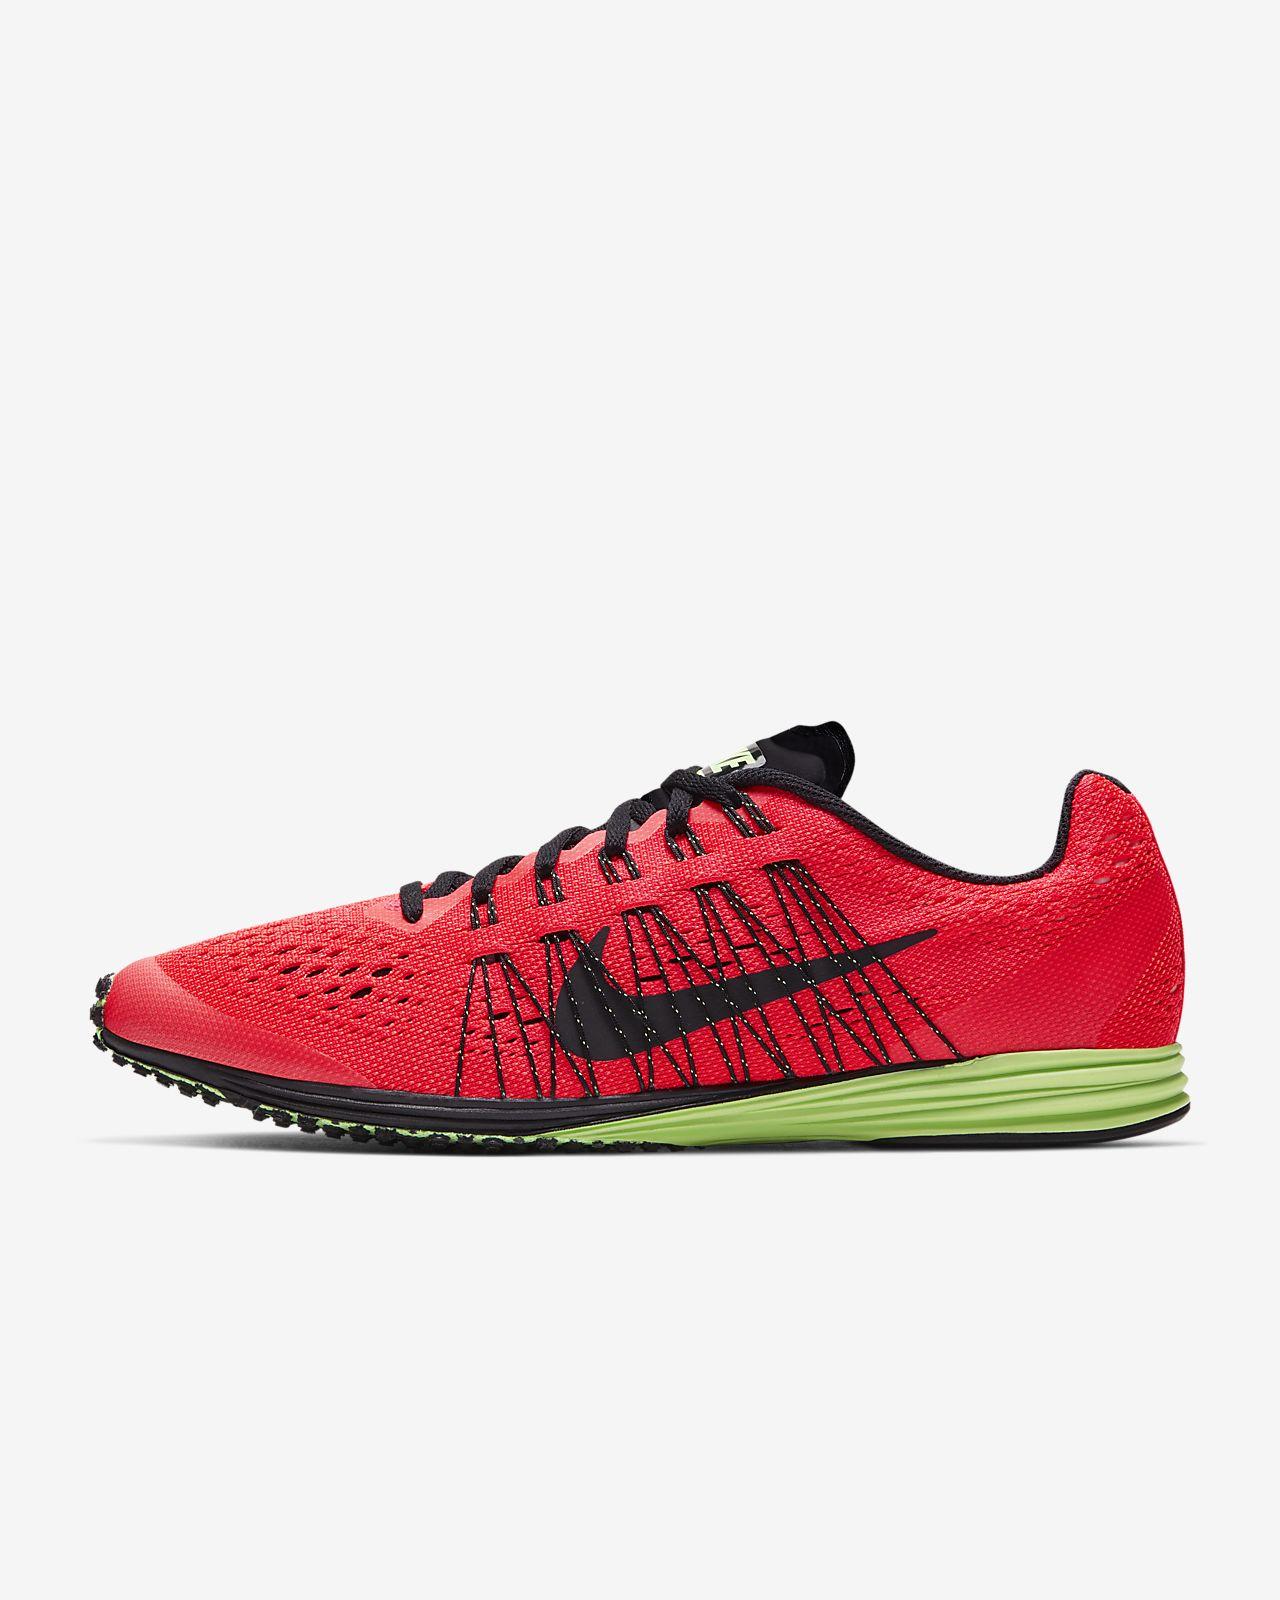 new style 68f2b 39136 ... Nike LunarSpider R 6 Unisex Running Shoe